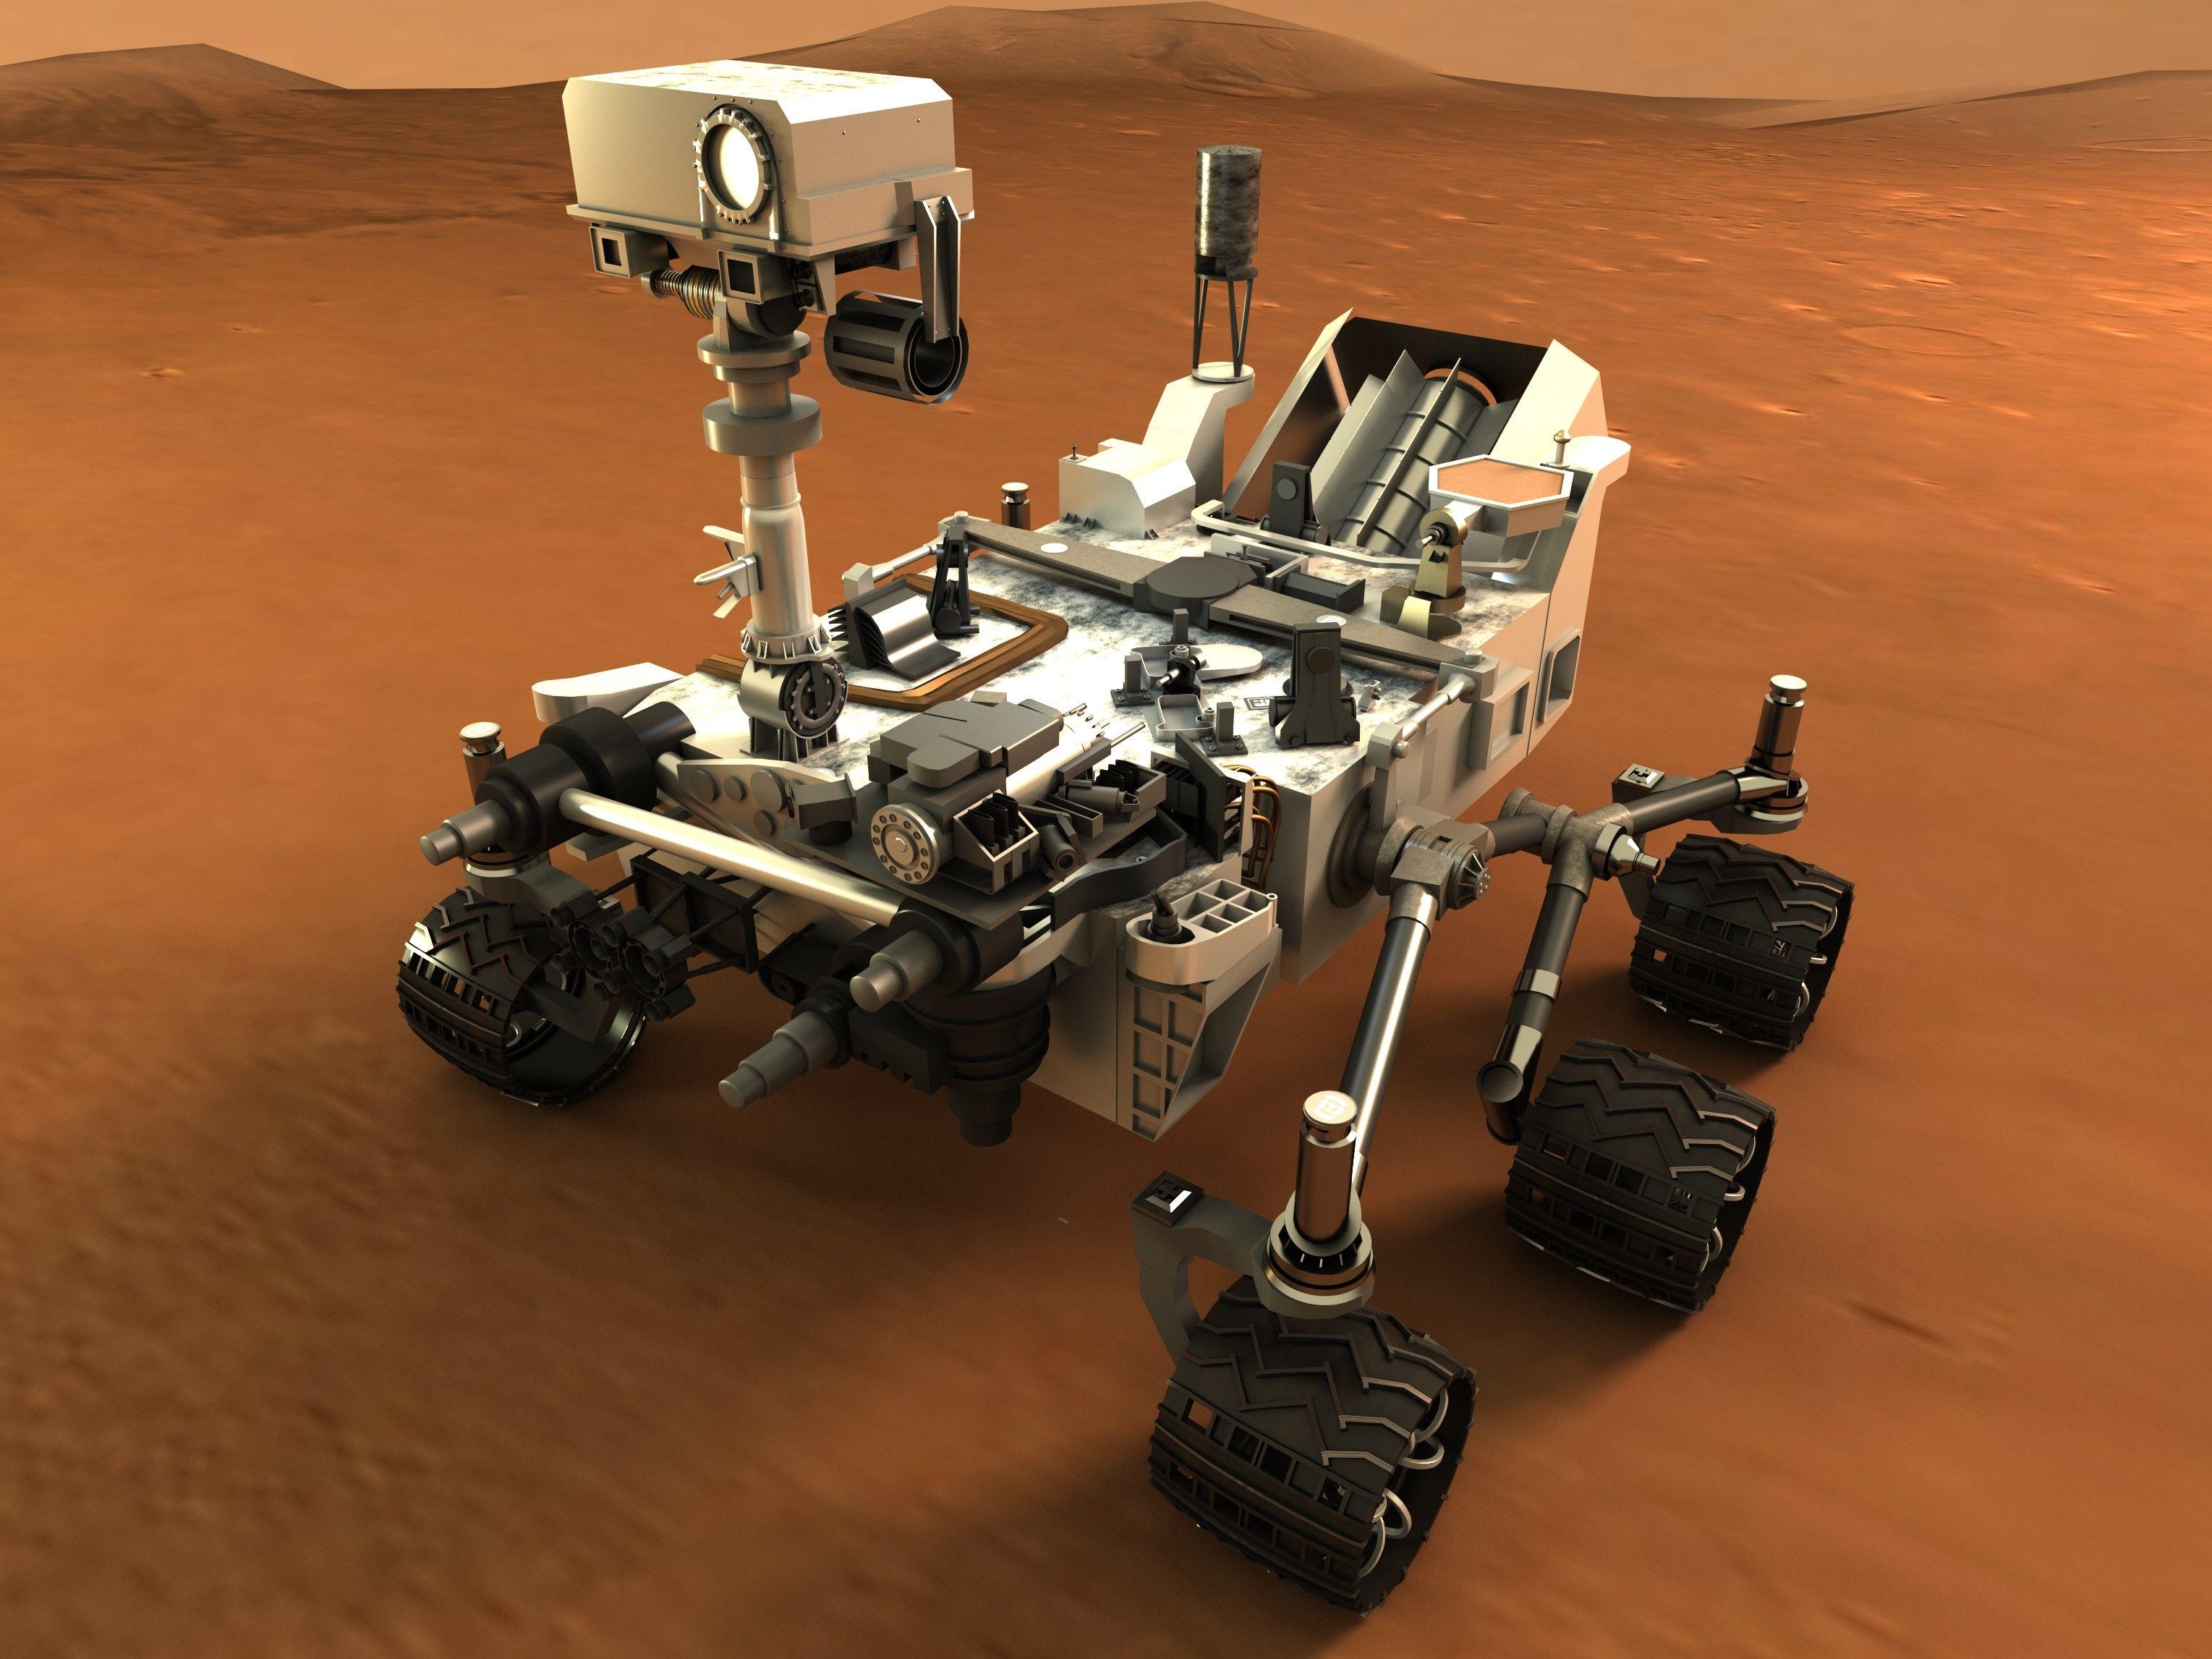 Curiosity Mars Rover Fbx - 3D Model | Curiosity mars, Mars ...